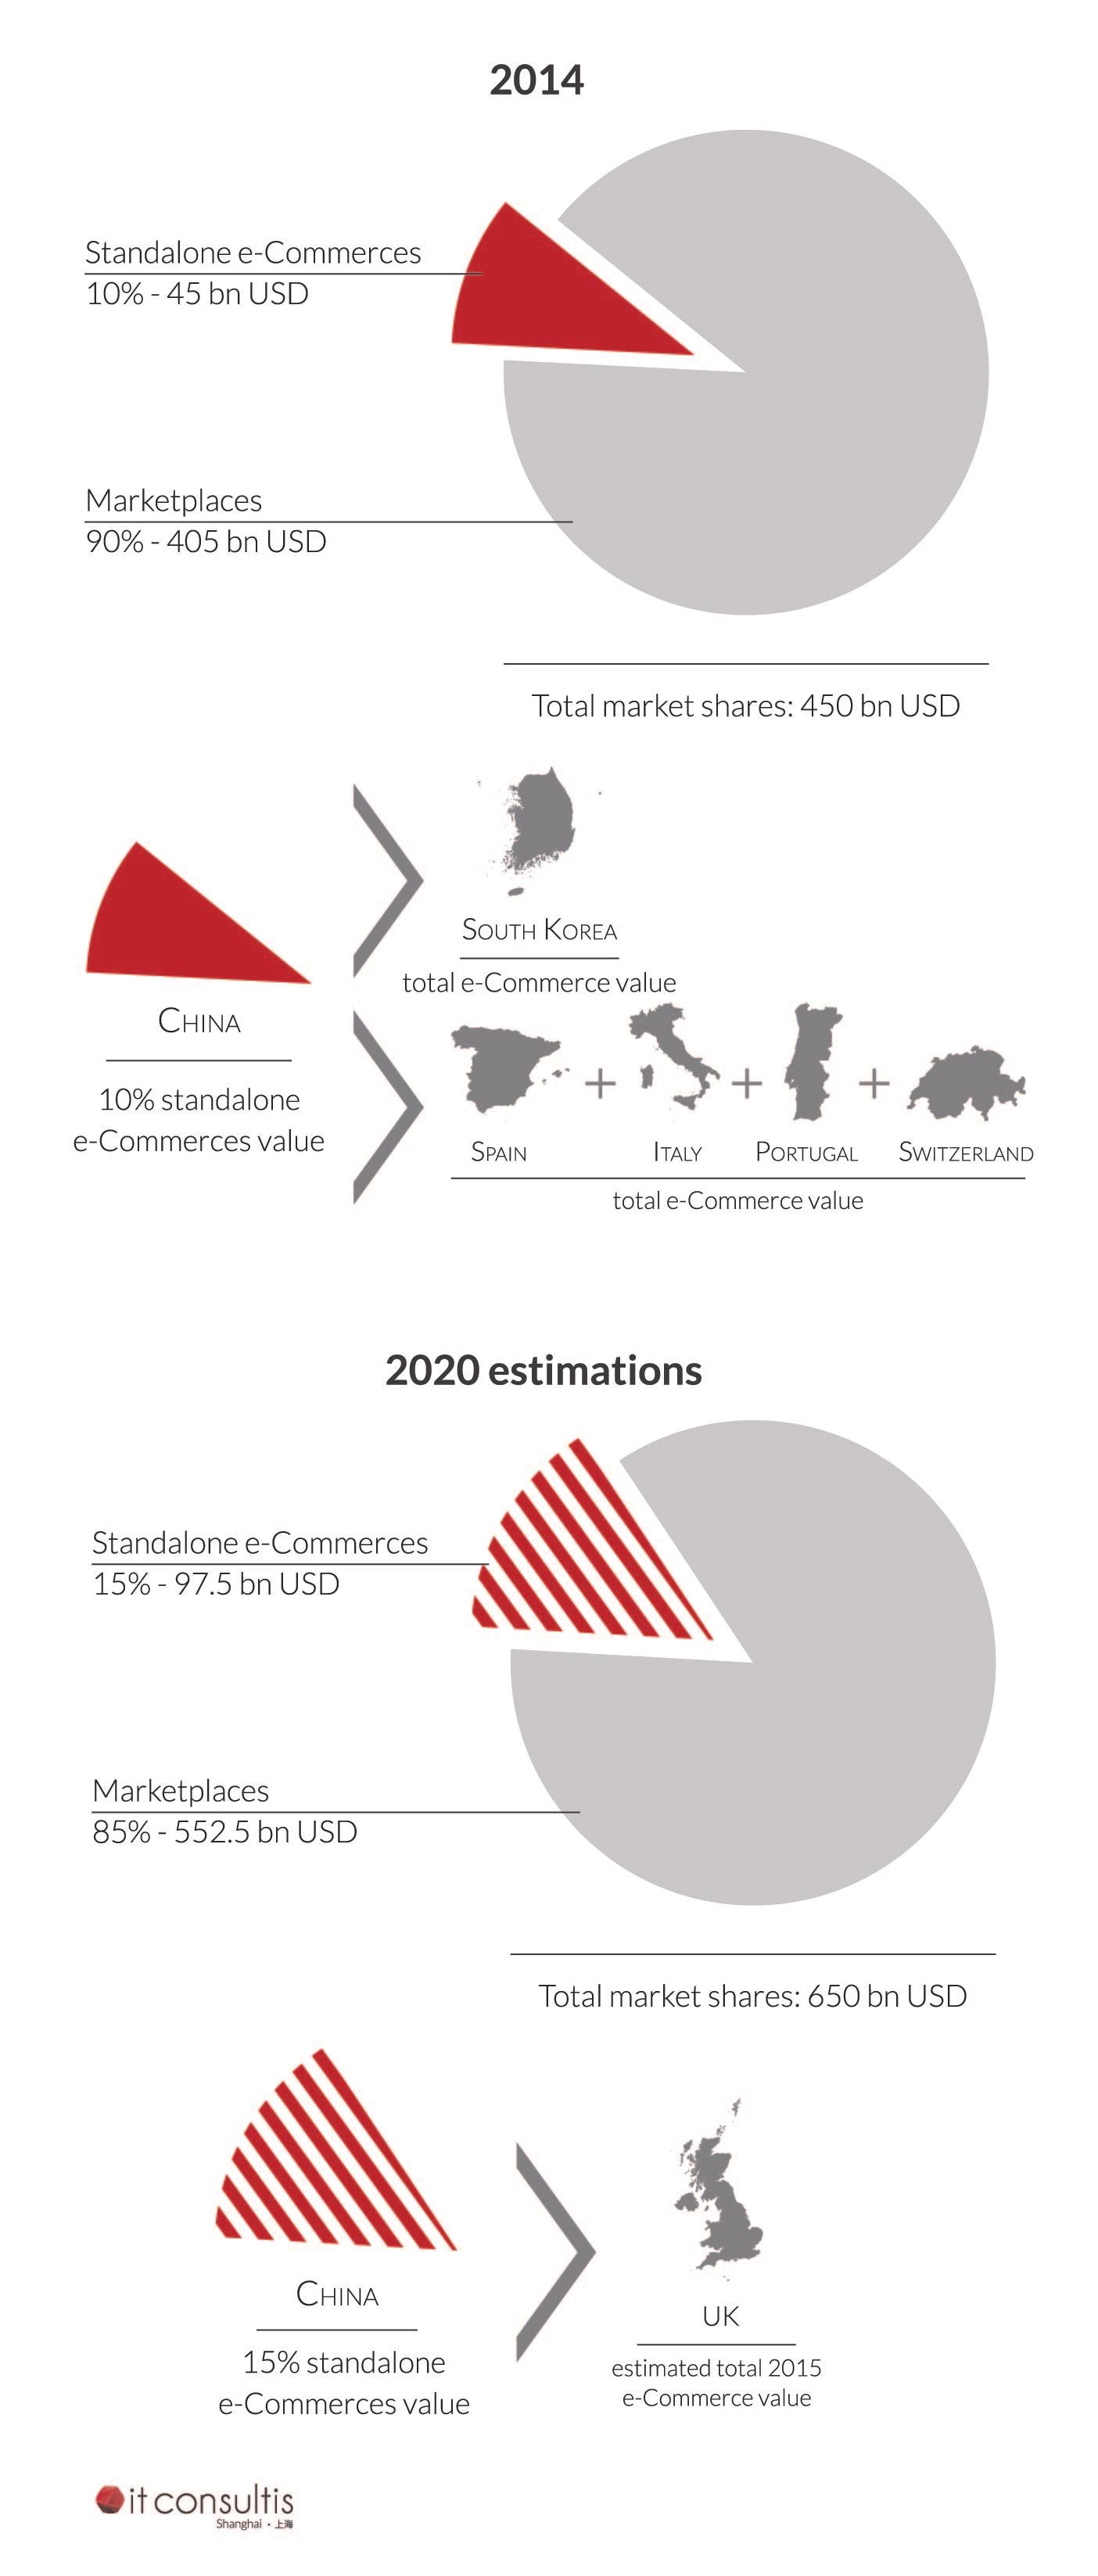 standalone e-Commerce estimations in China